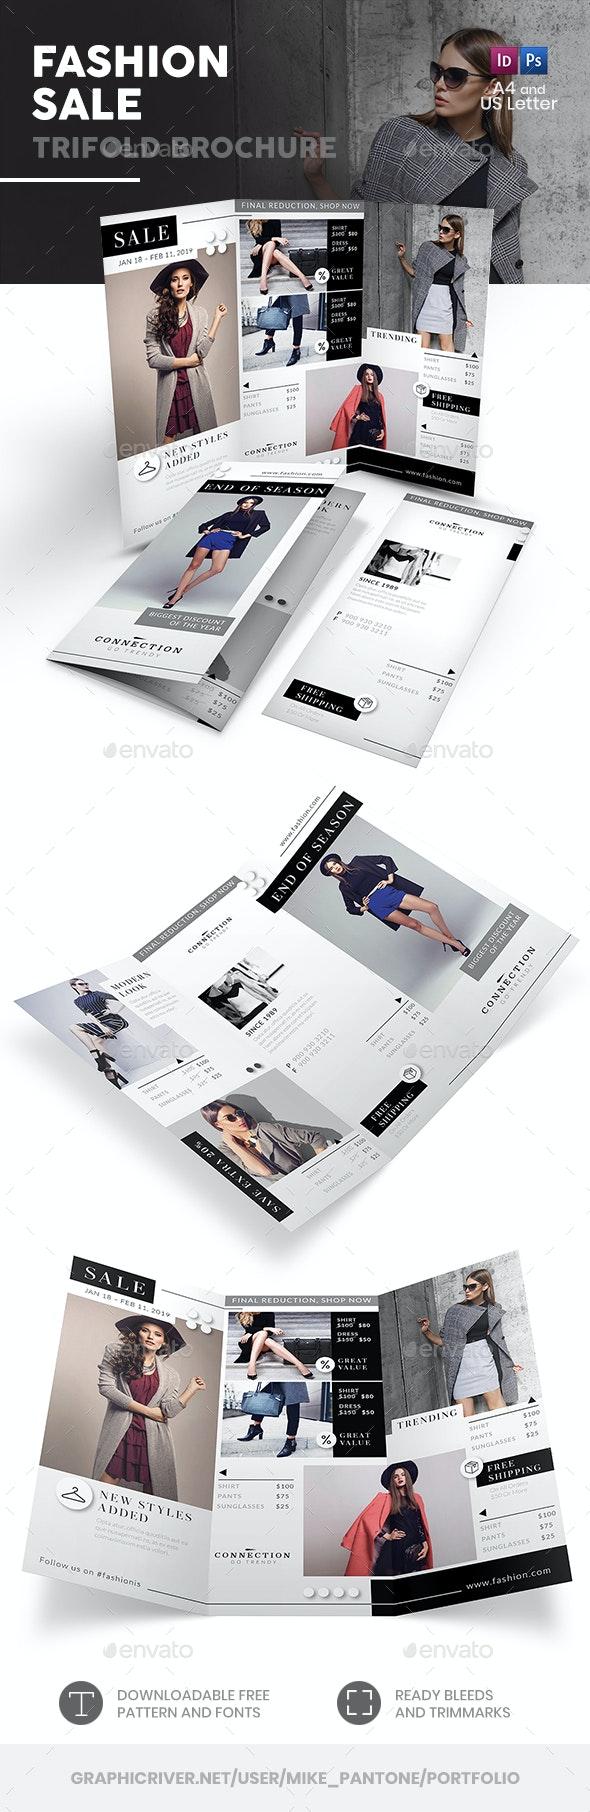 Fashion Shop Sale Trifold Brochure - Informational Brochures